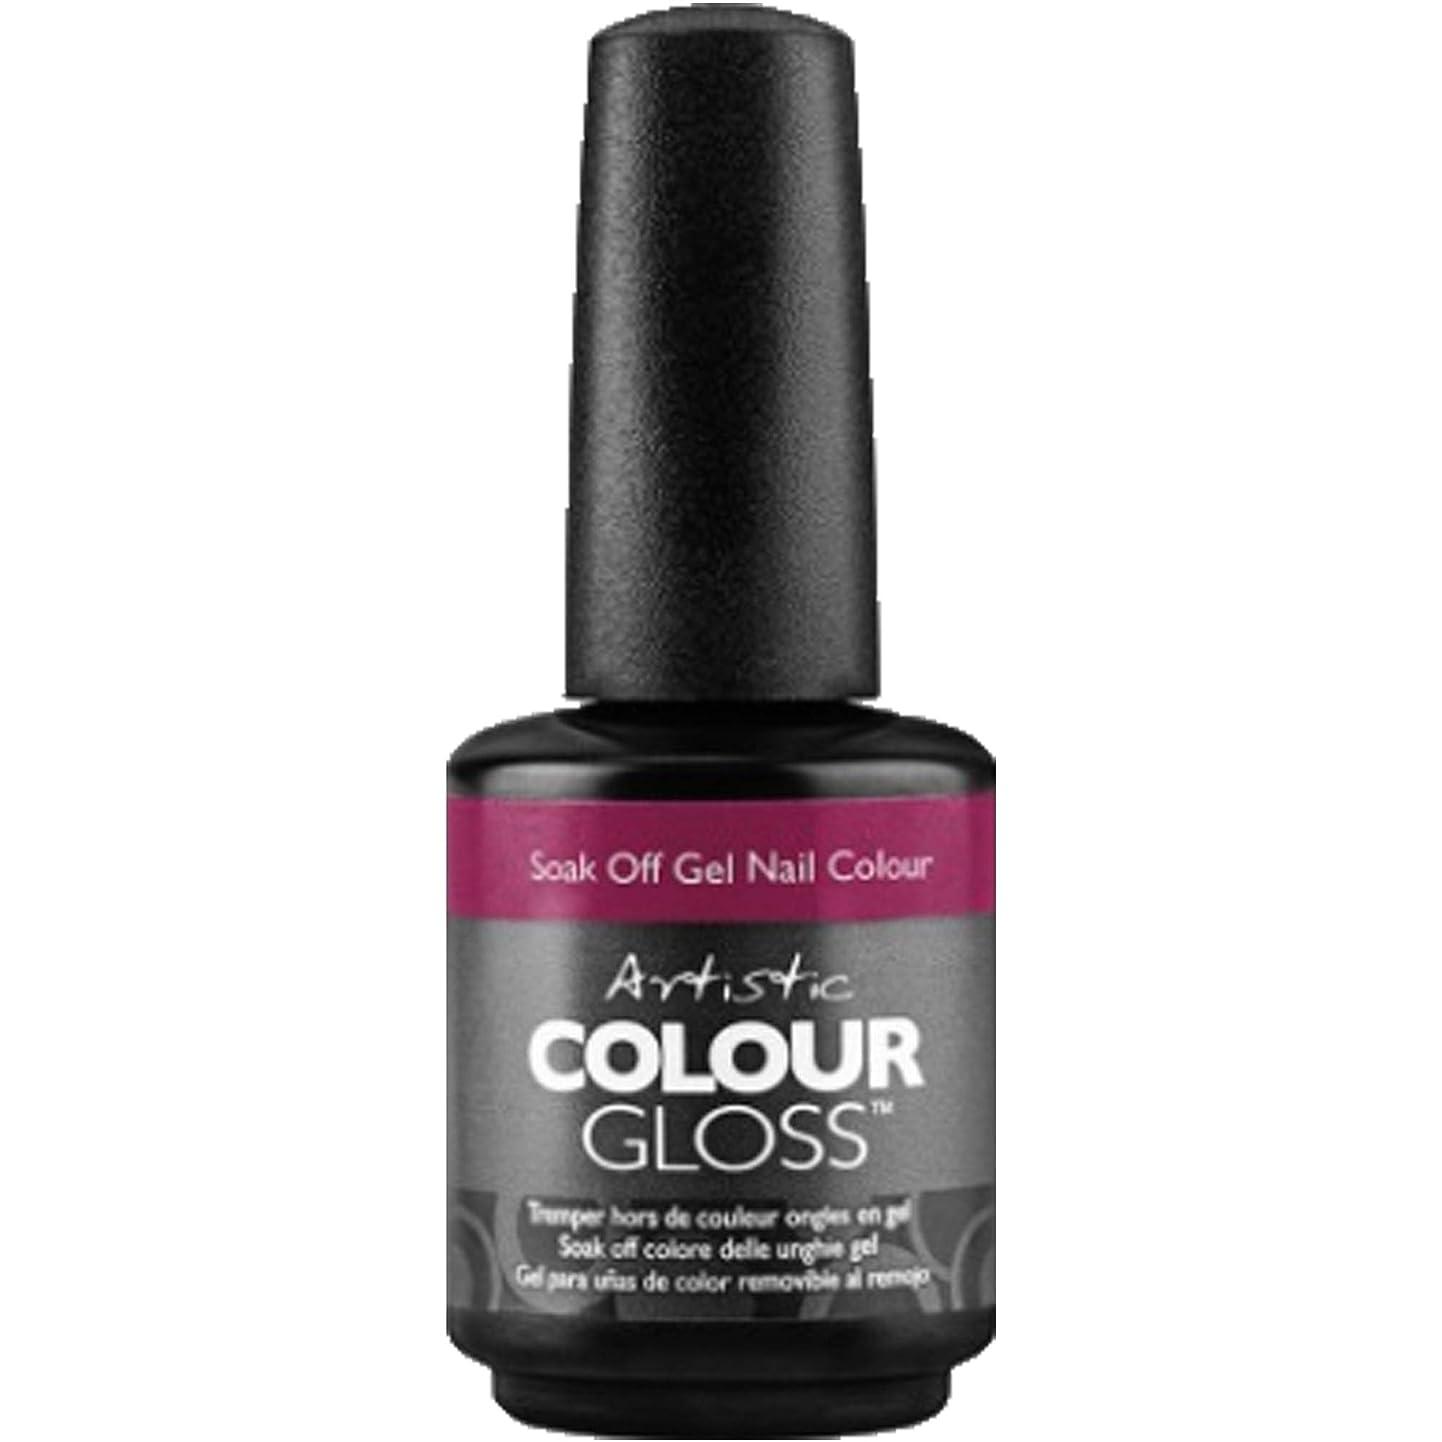 定数用量謝るArtistic Colour Gloss - Night Cap - 0.5oz / 15ml